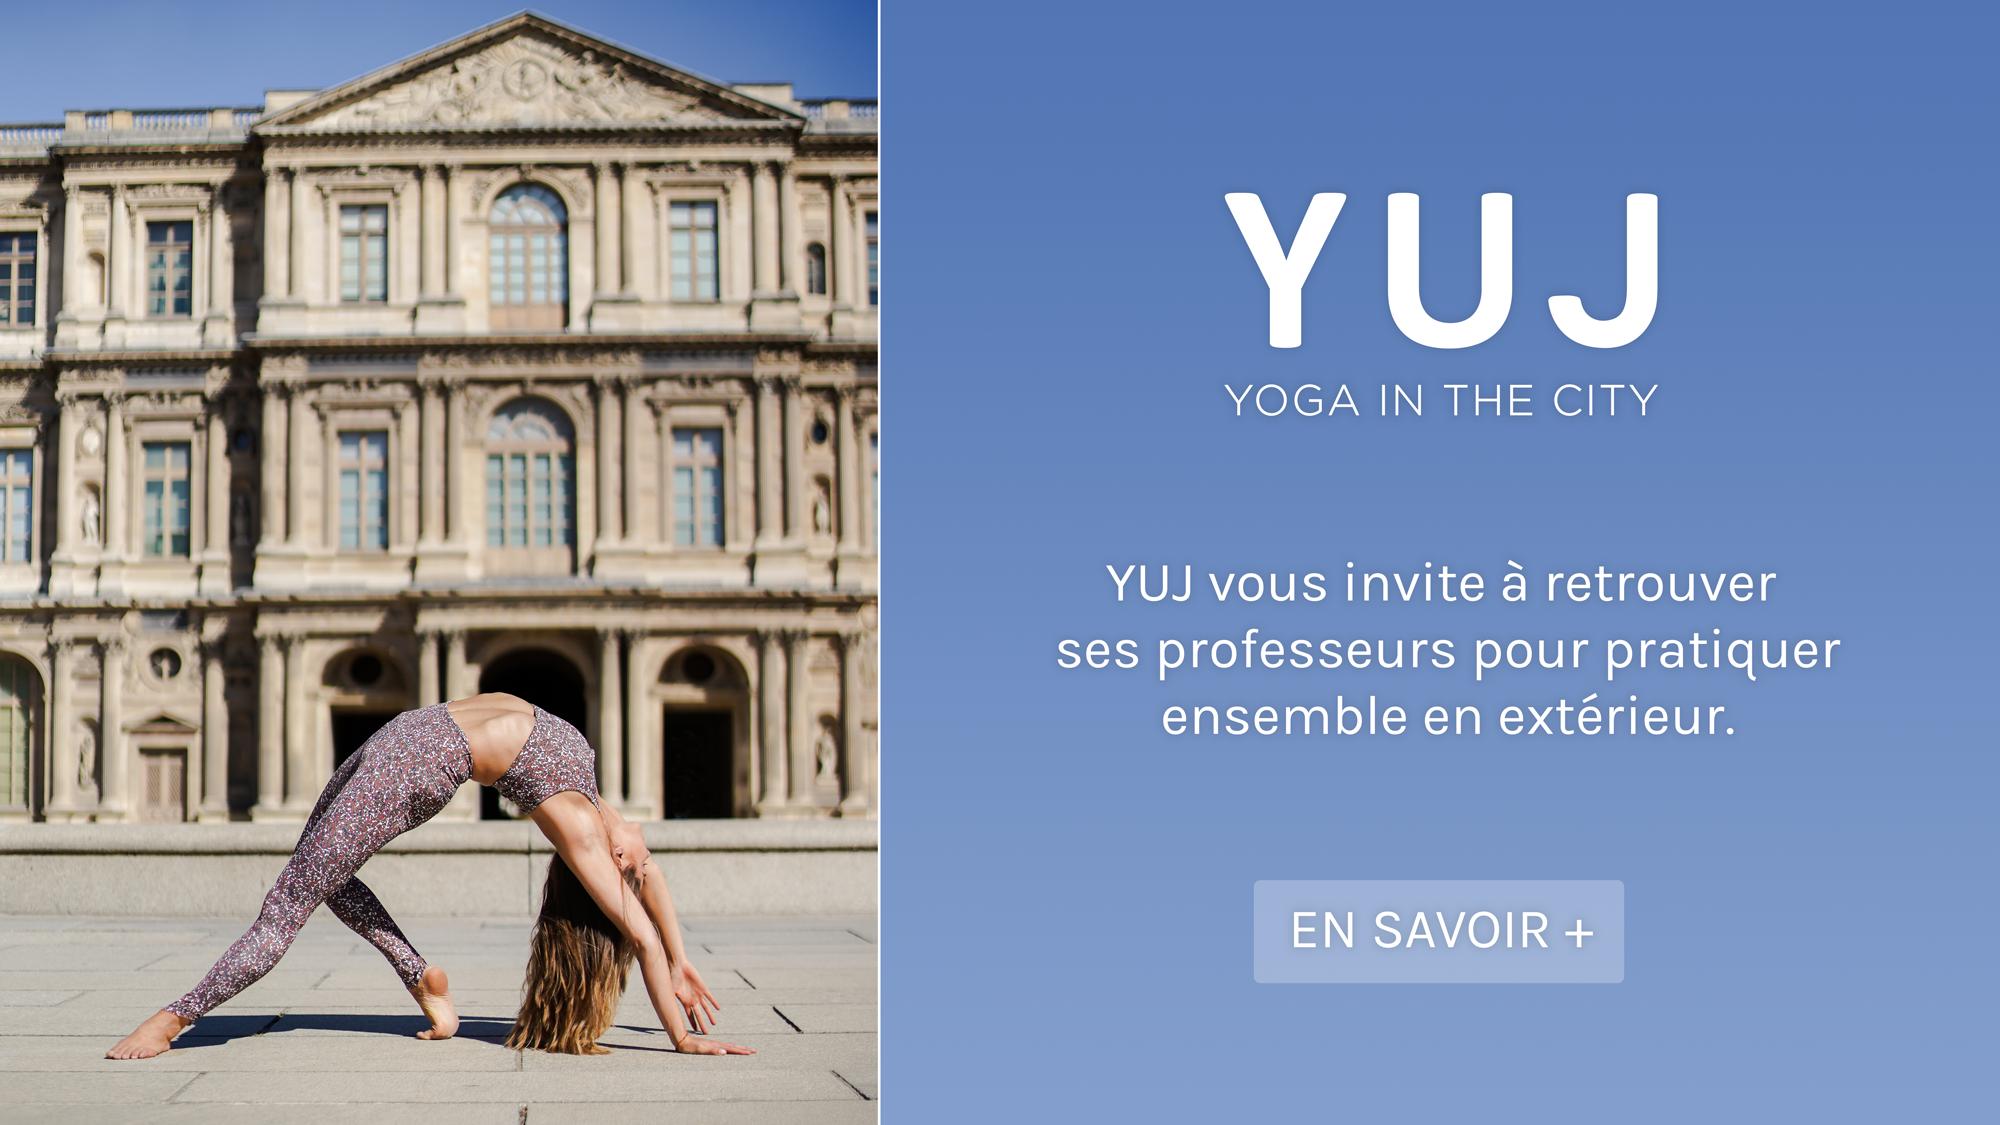 header-yuj-yoga-in-the-city